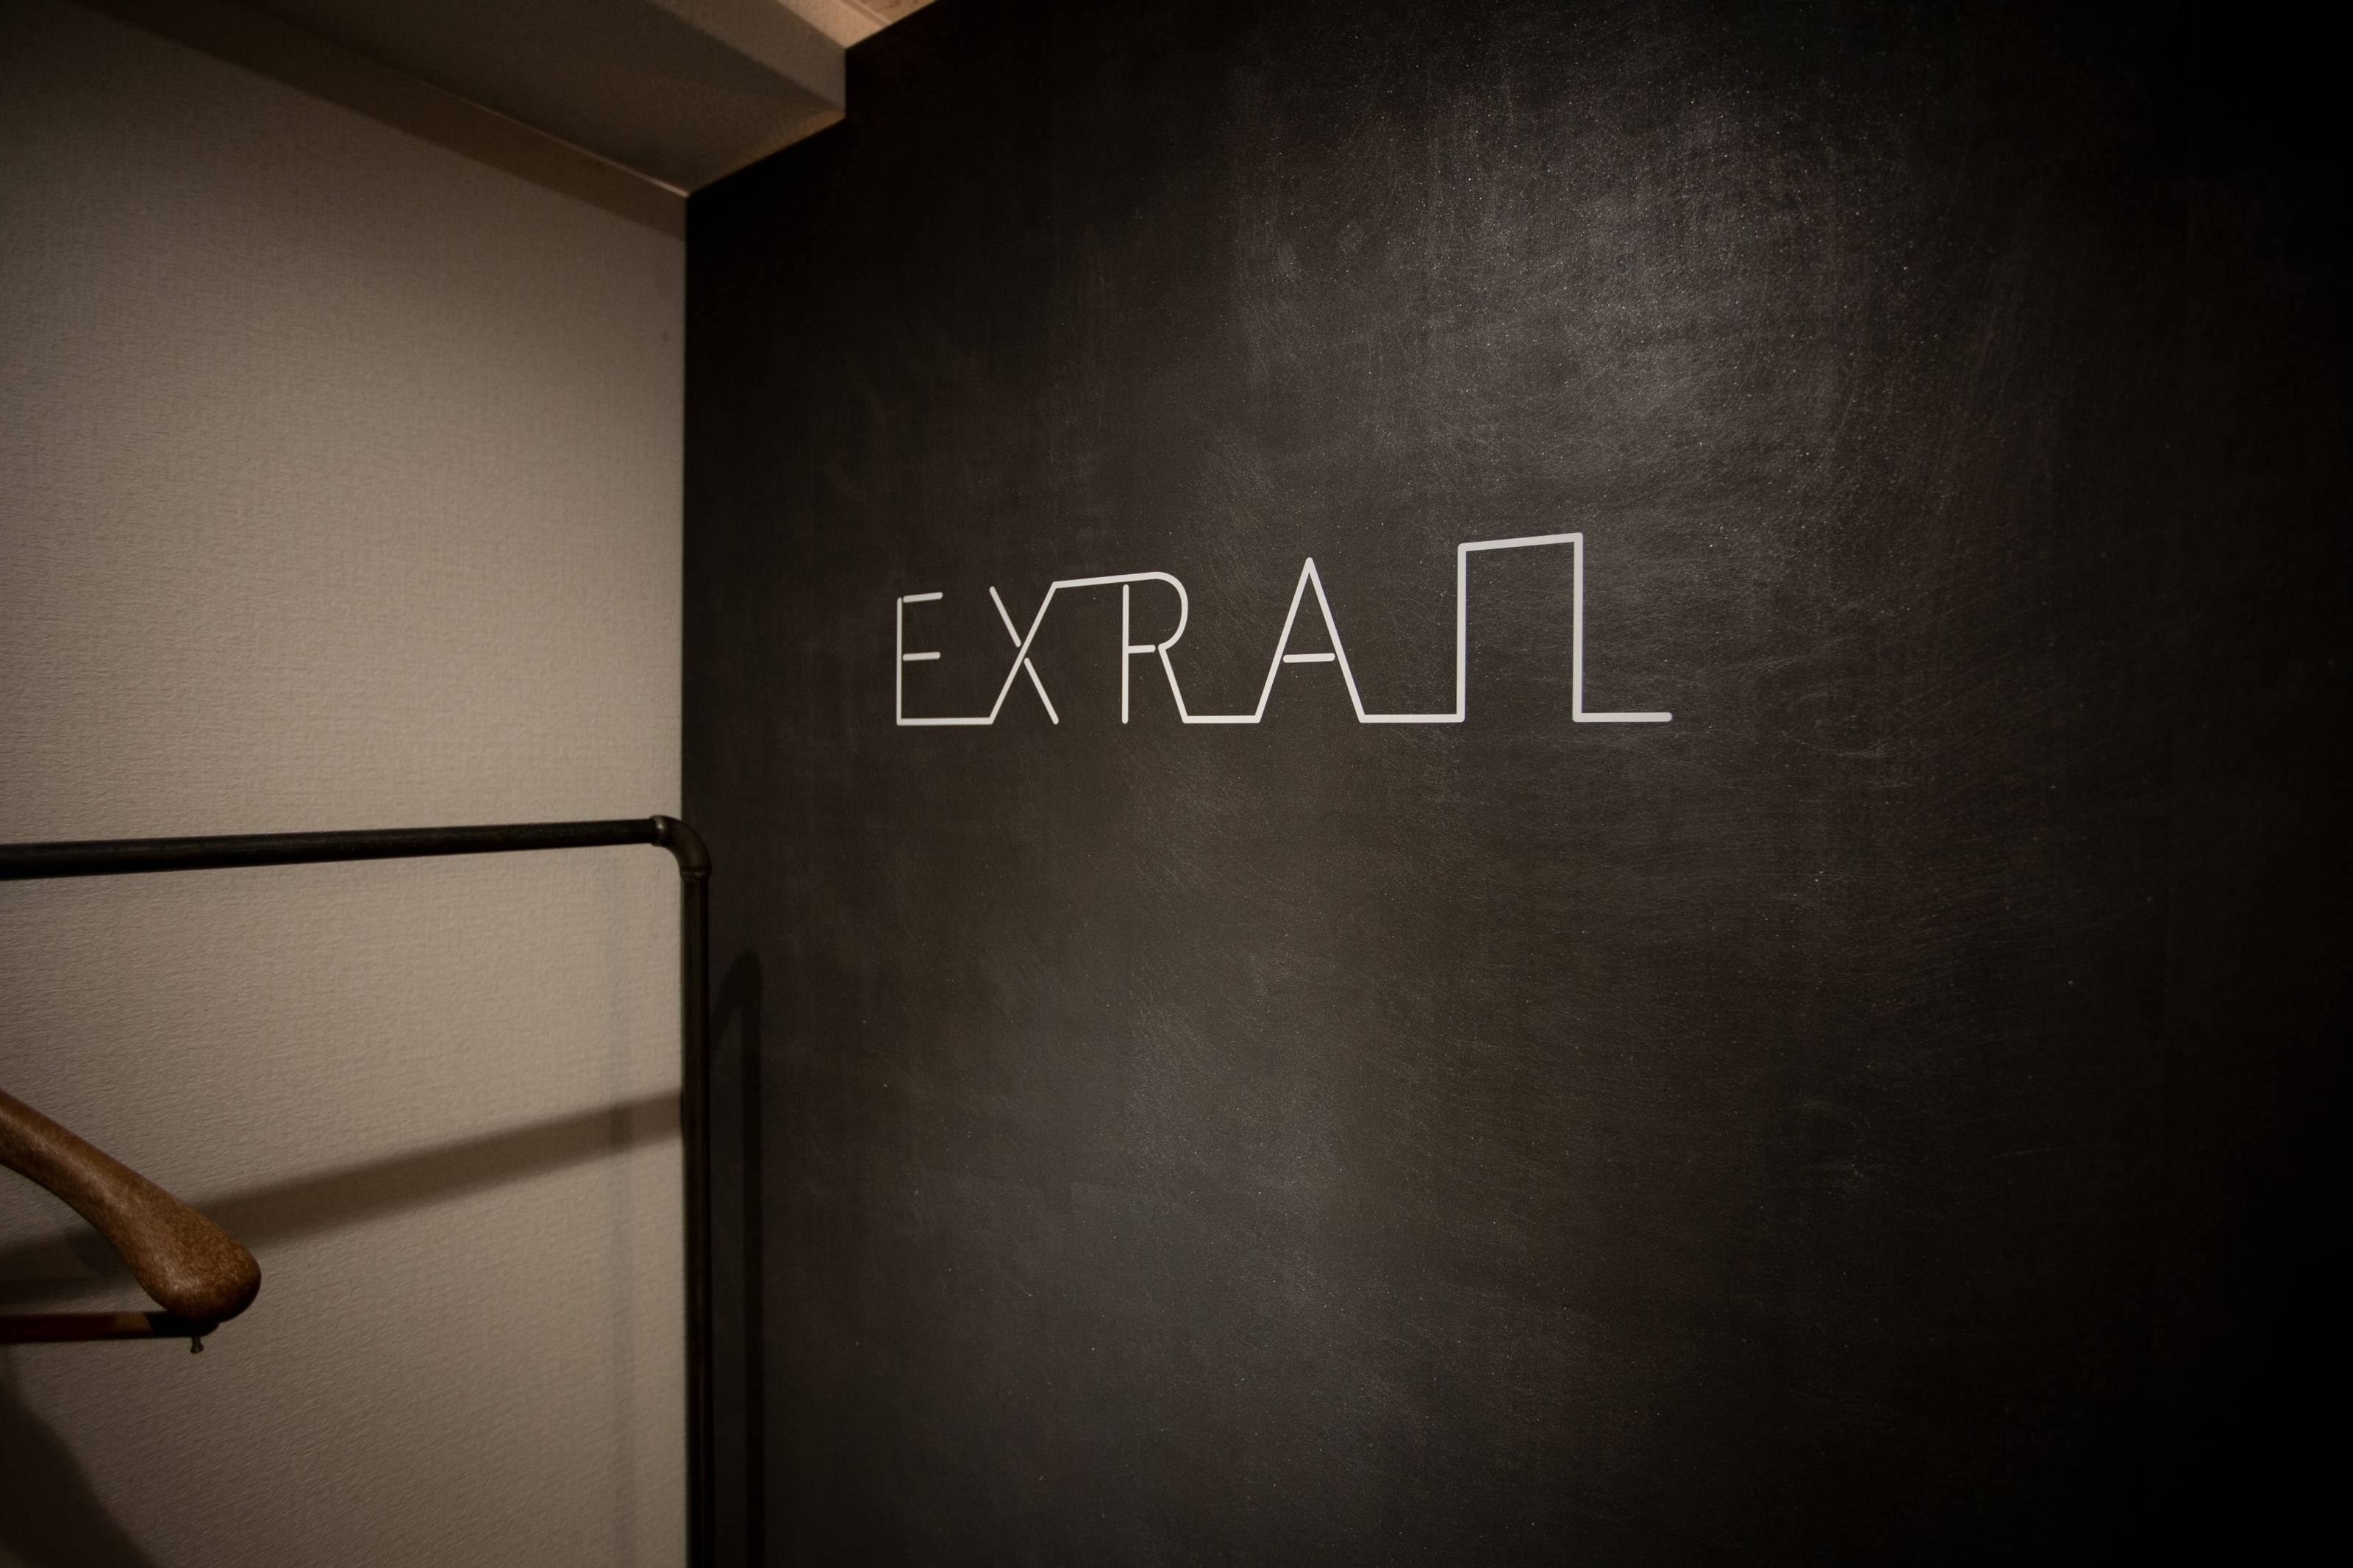 株式会社Exrail